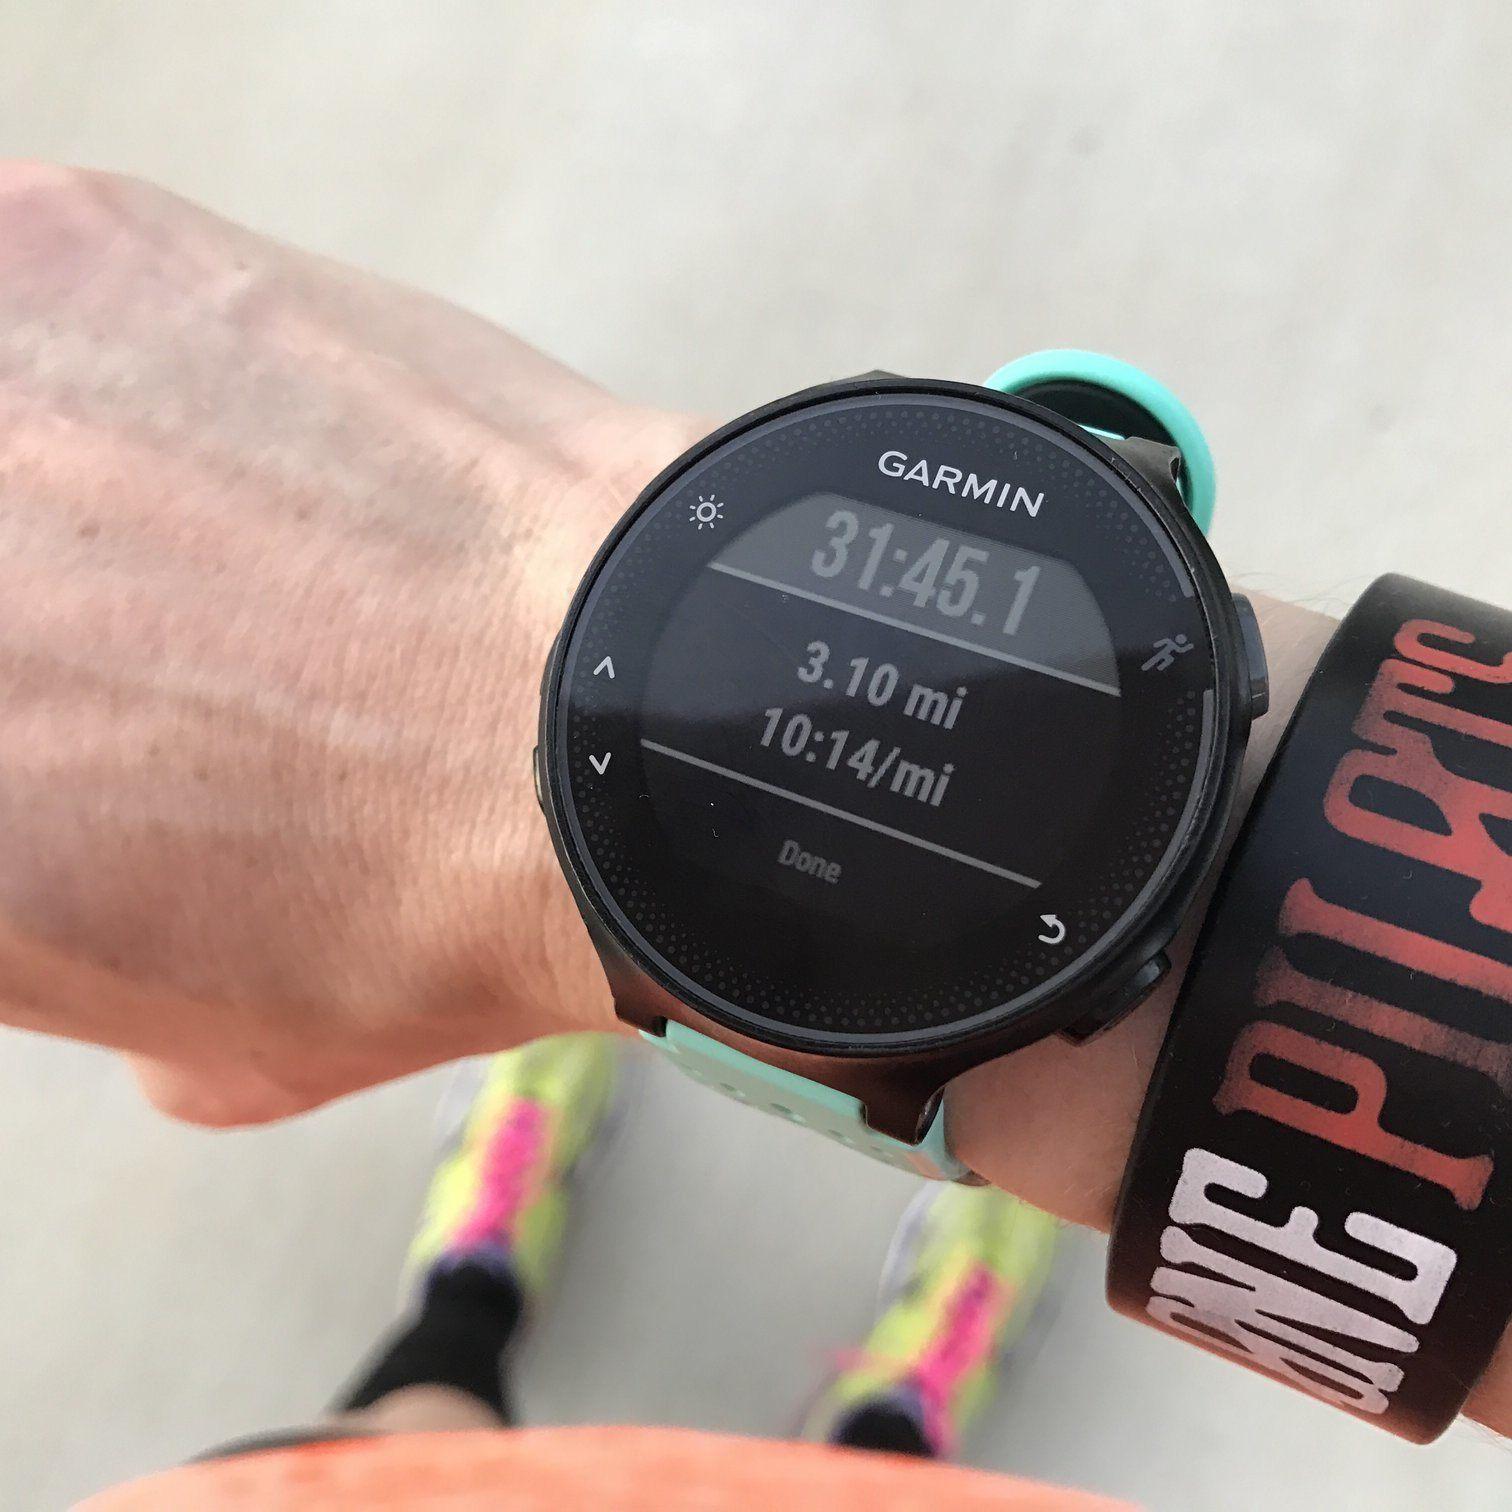 comprar bien zapatos deportivos la mejor actitud Runnergirl Training: Product Review: Nike Plus Apple Watch